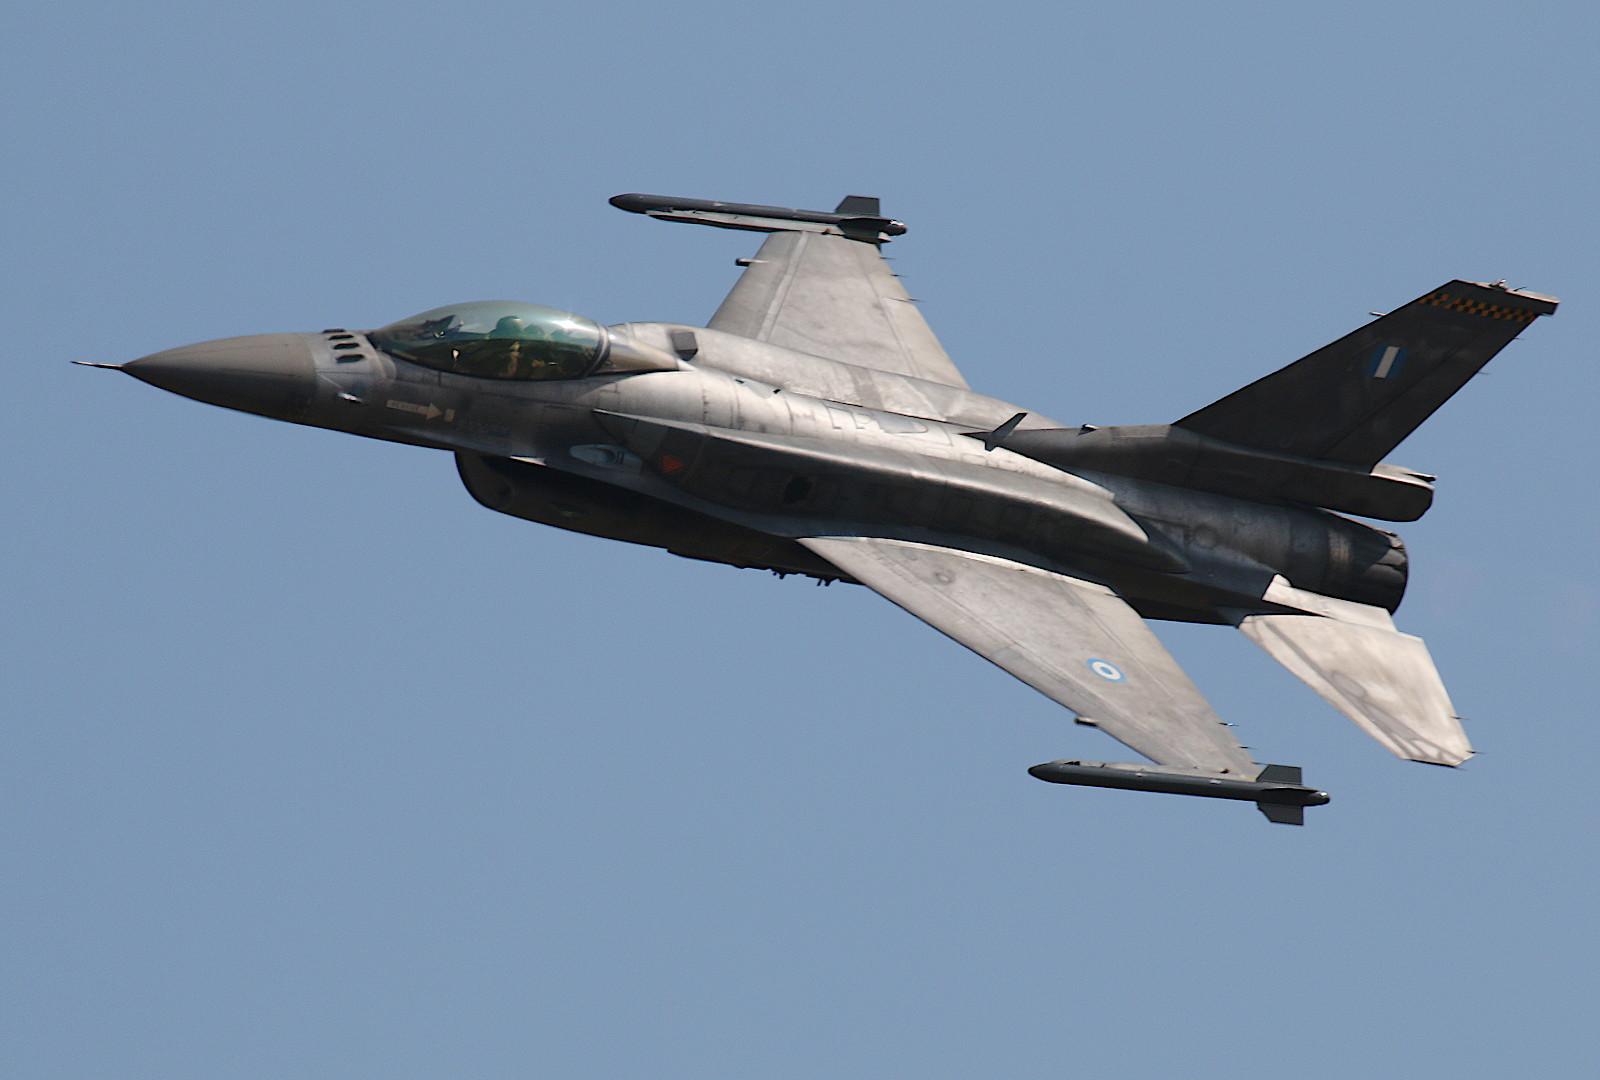 Lockheed Martin F-16C Fighting Falcon 520 aus Griechenland © Doppeladler.com